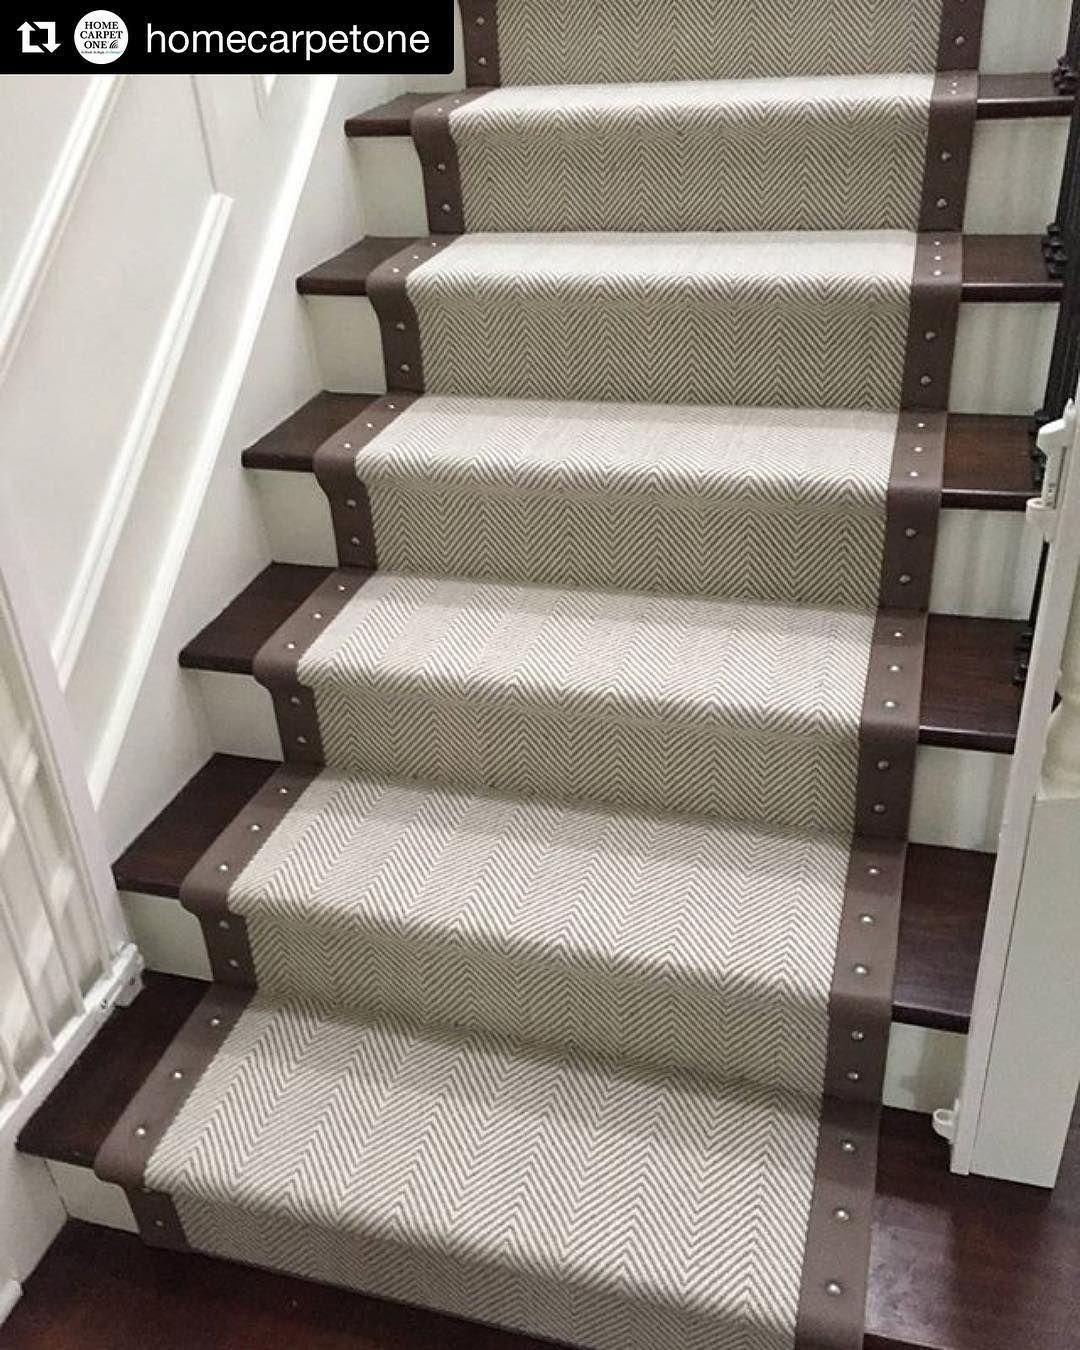 Best Stair Carpet Staircarpets Staircarpetideas Stair Rugs 400 x 300